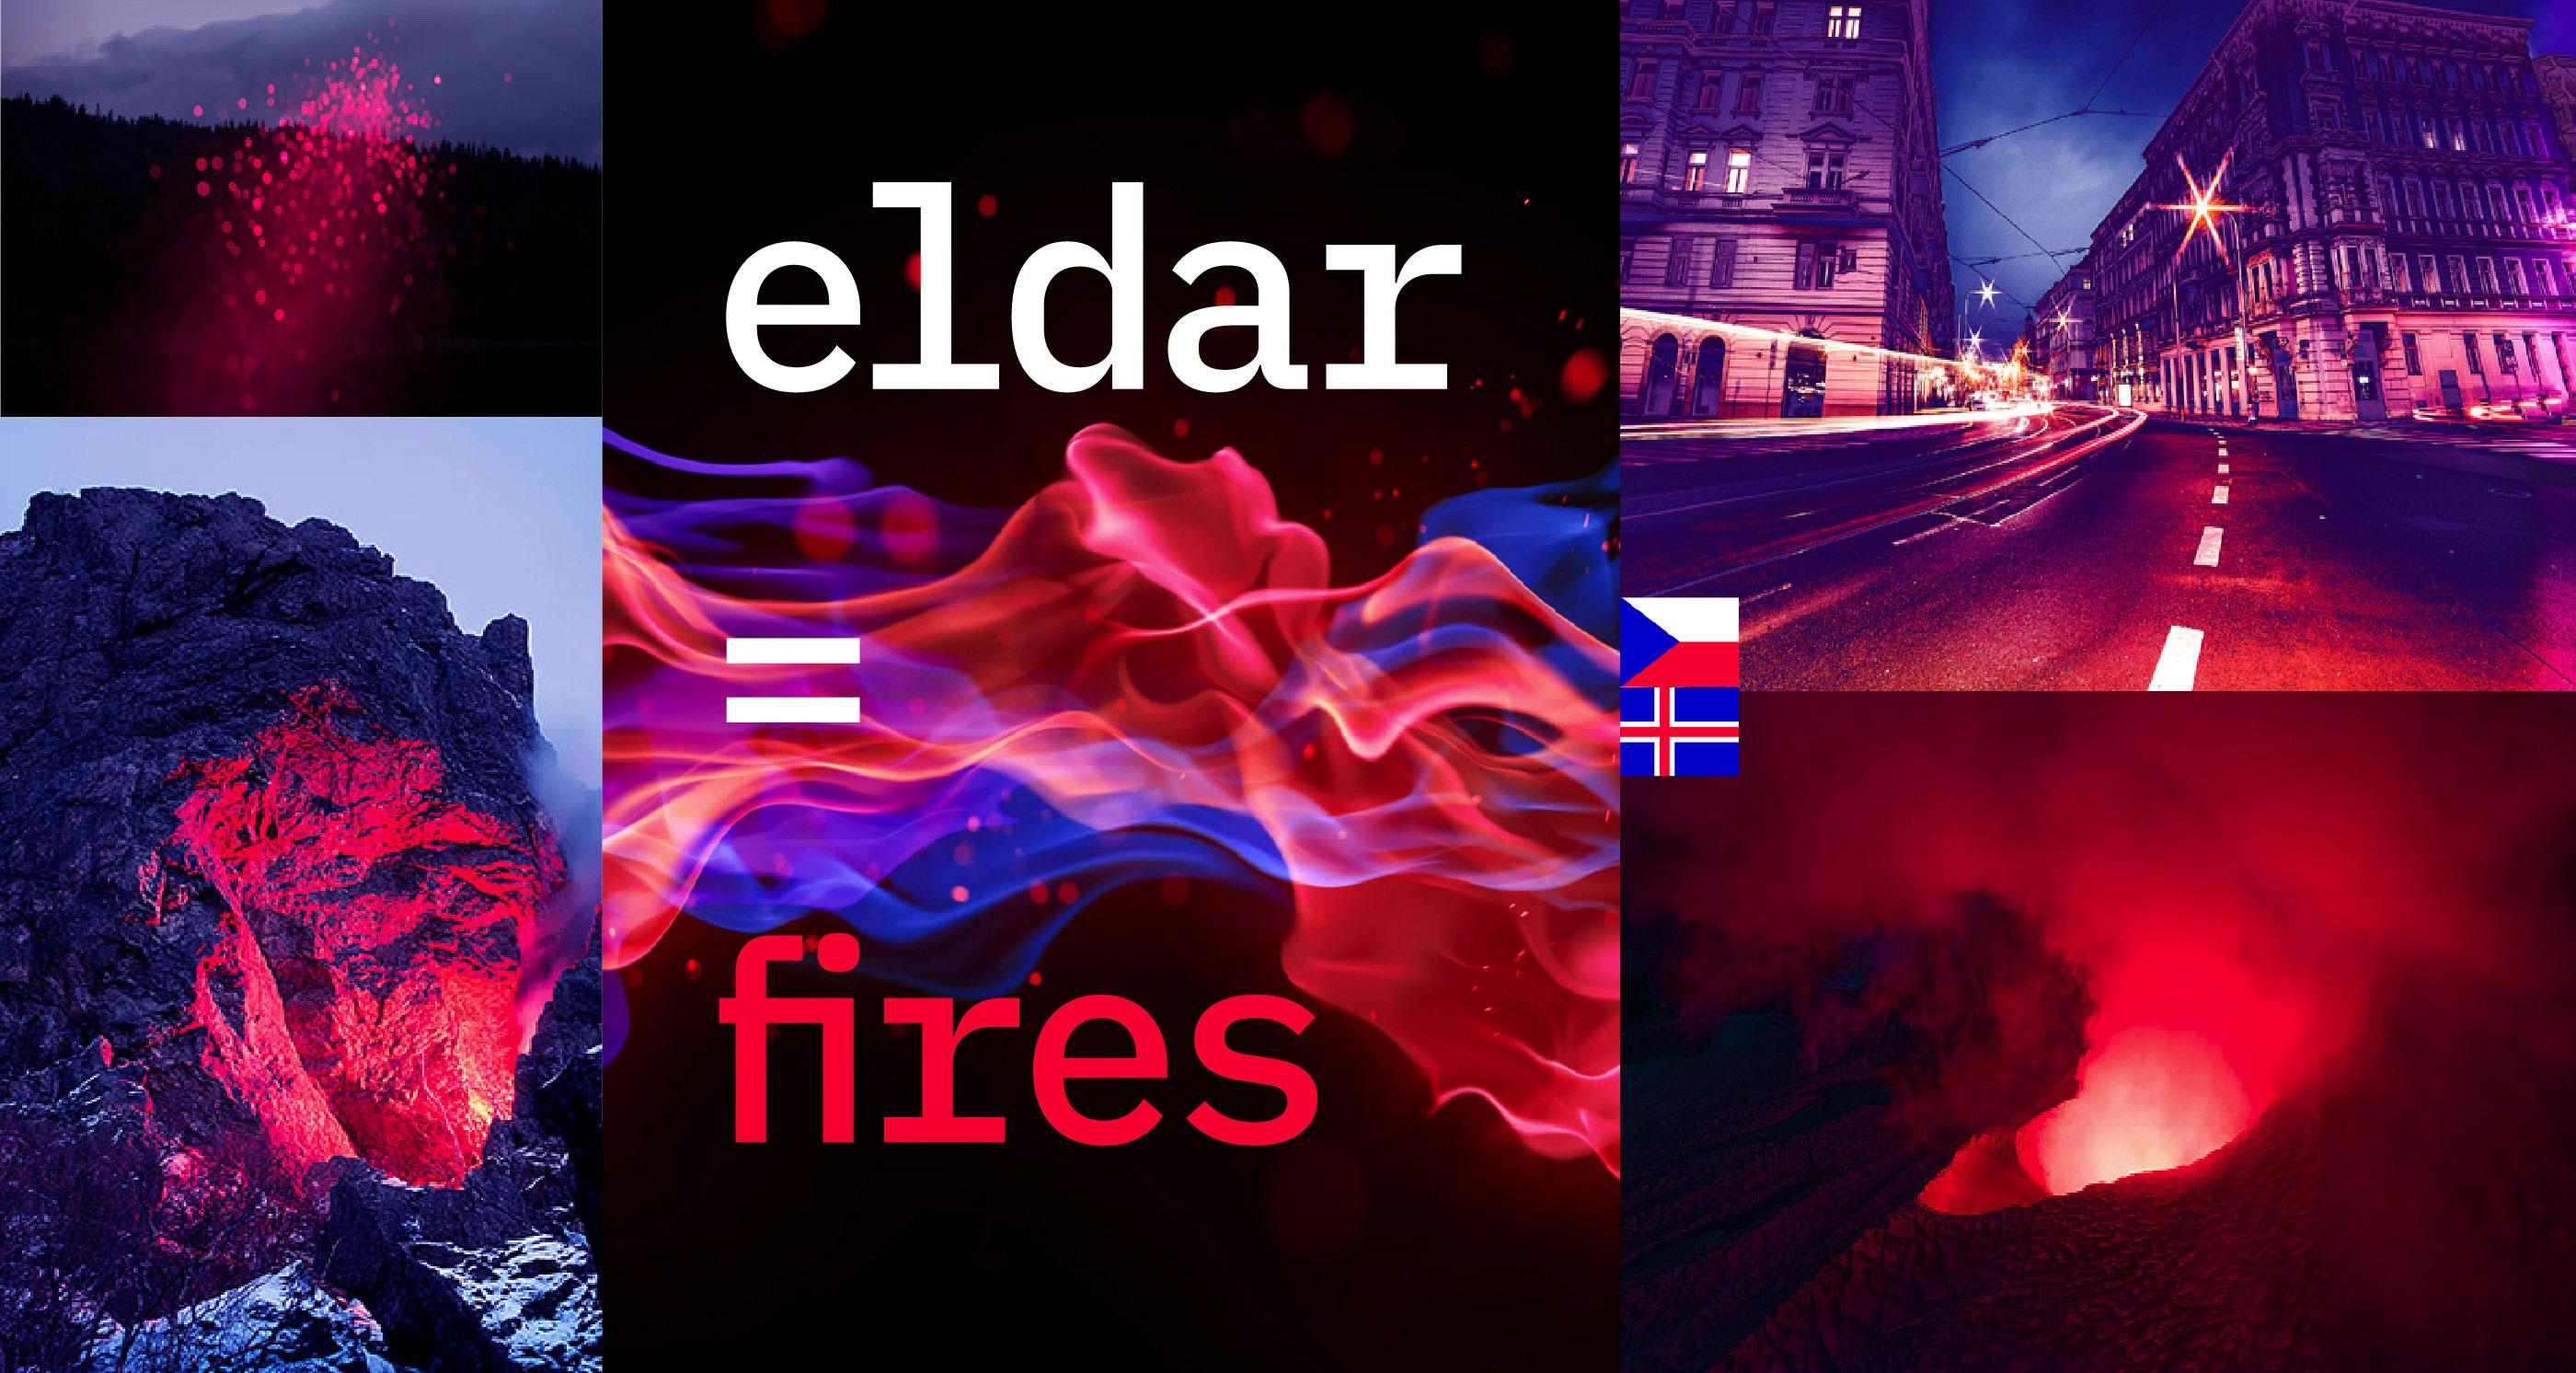 Eldar-Identity-Concept